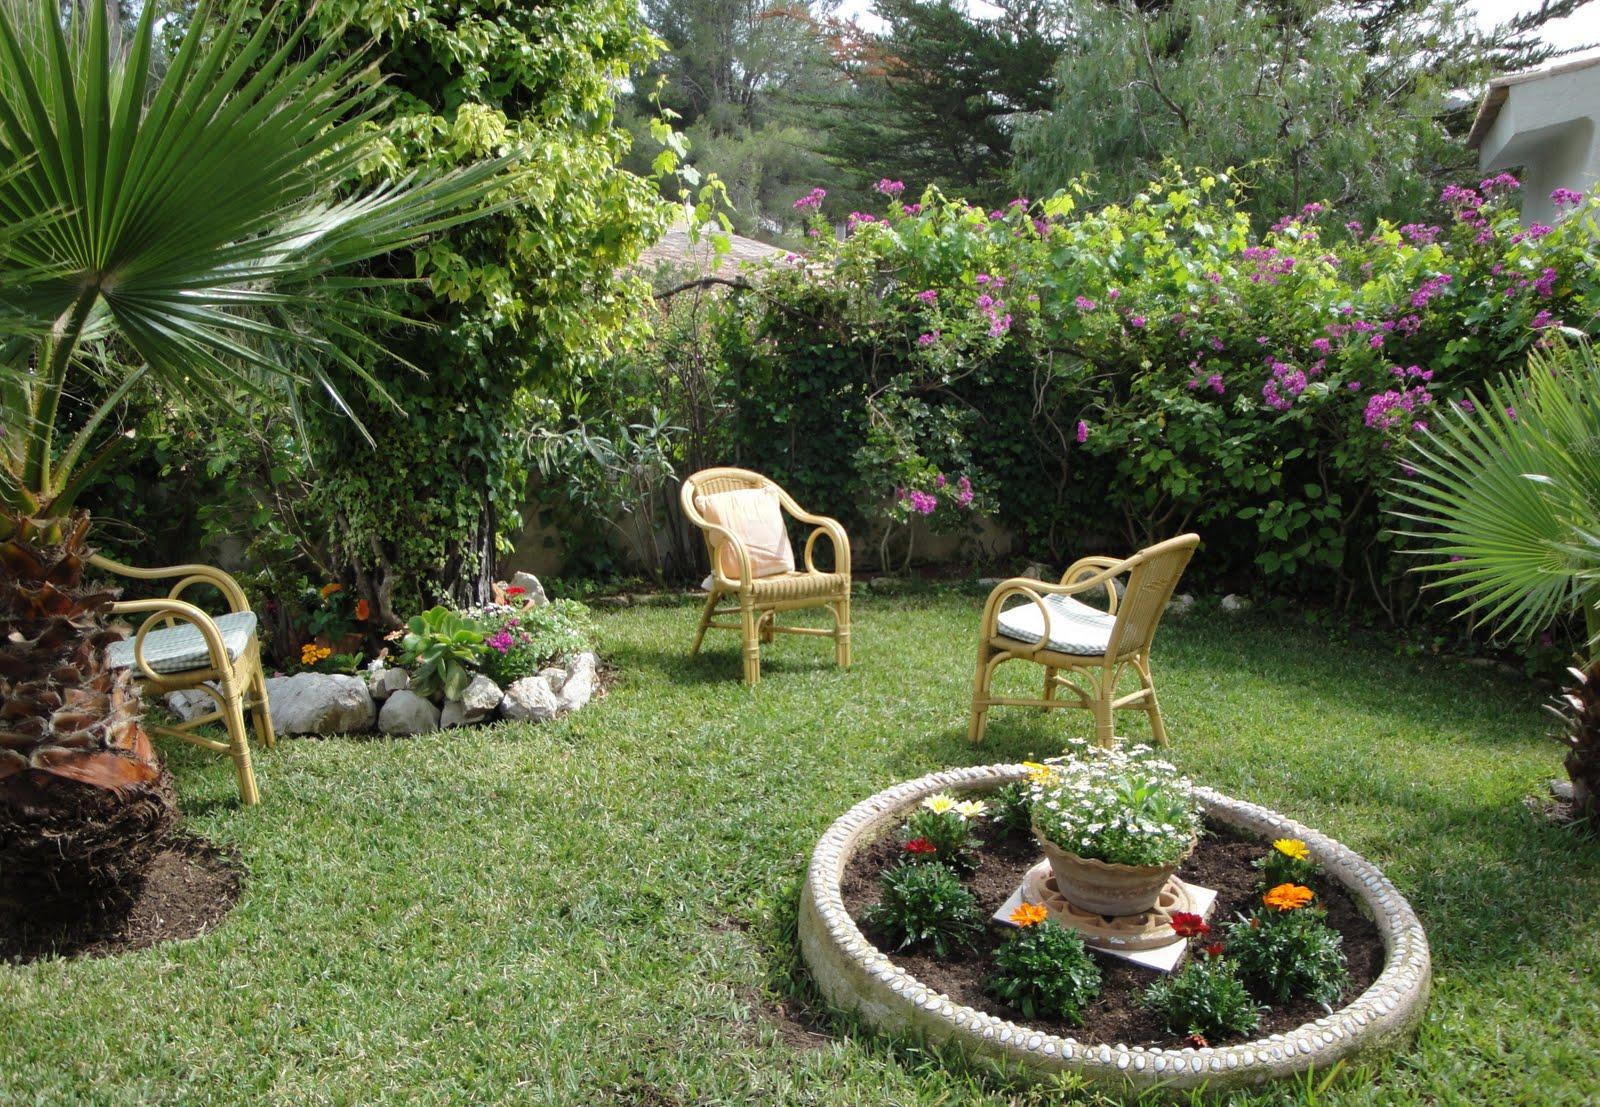 La mimosa de mi jardin un rinc ne mi jardin for Arreglar el jardin de casa